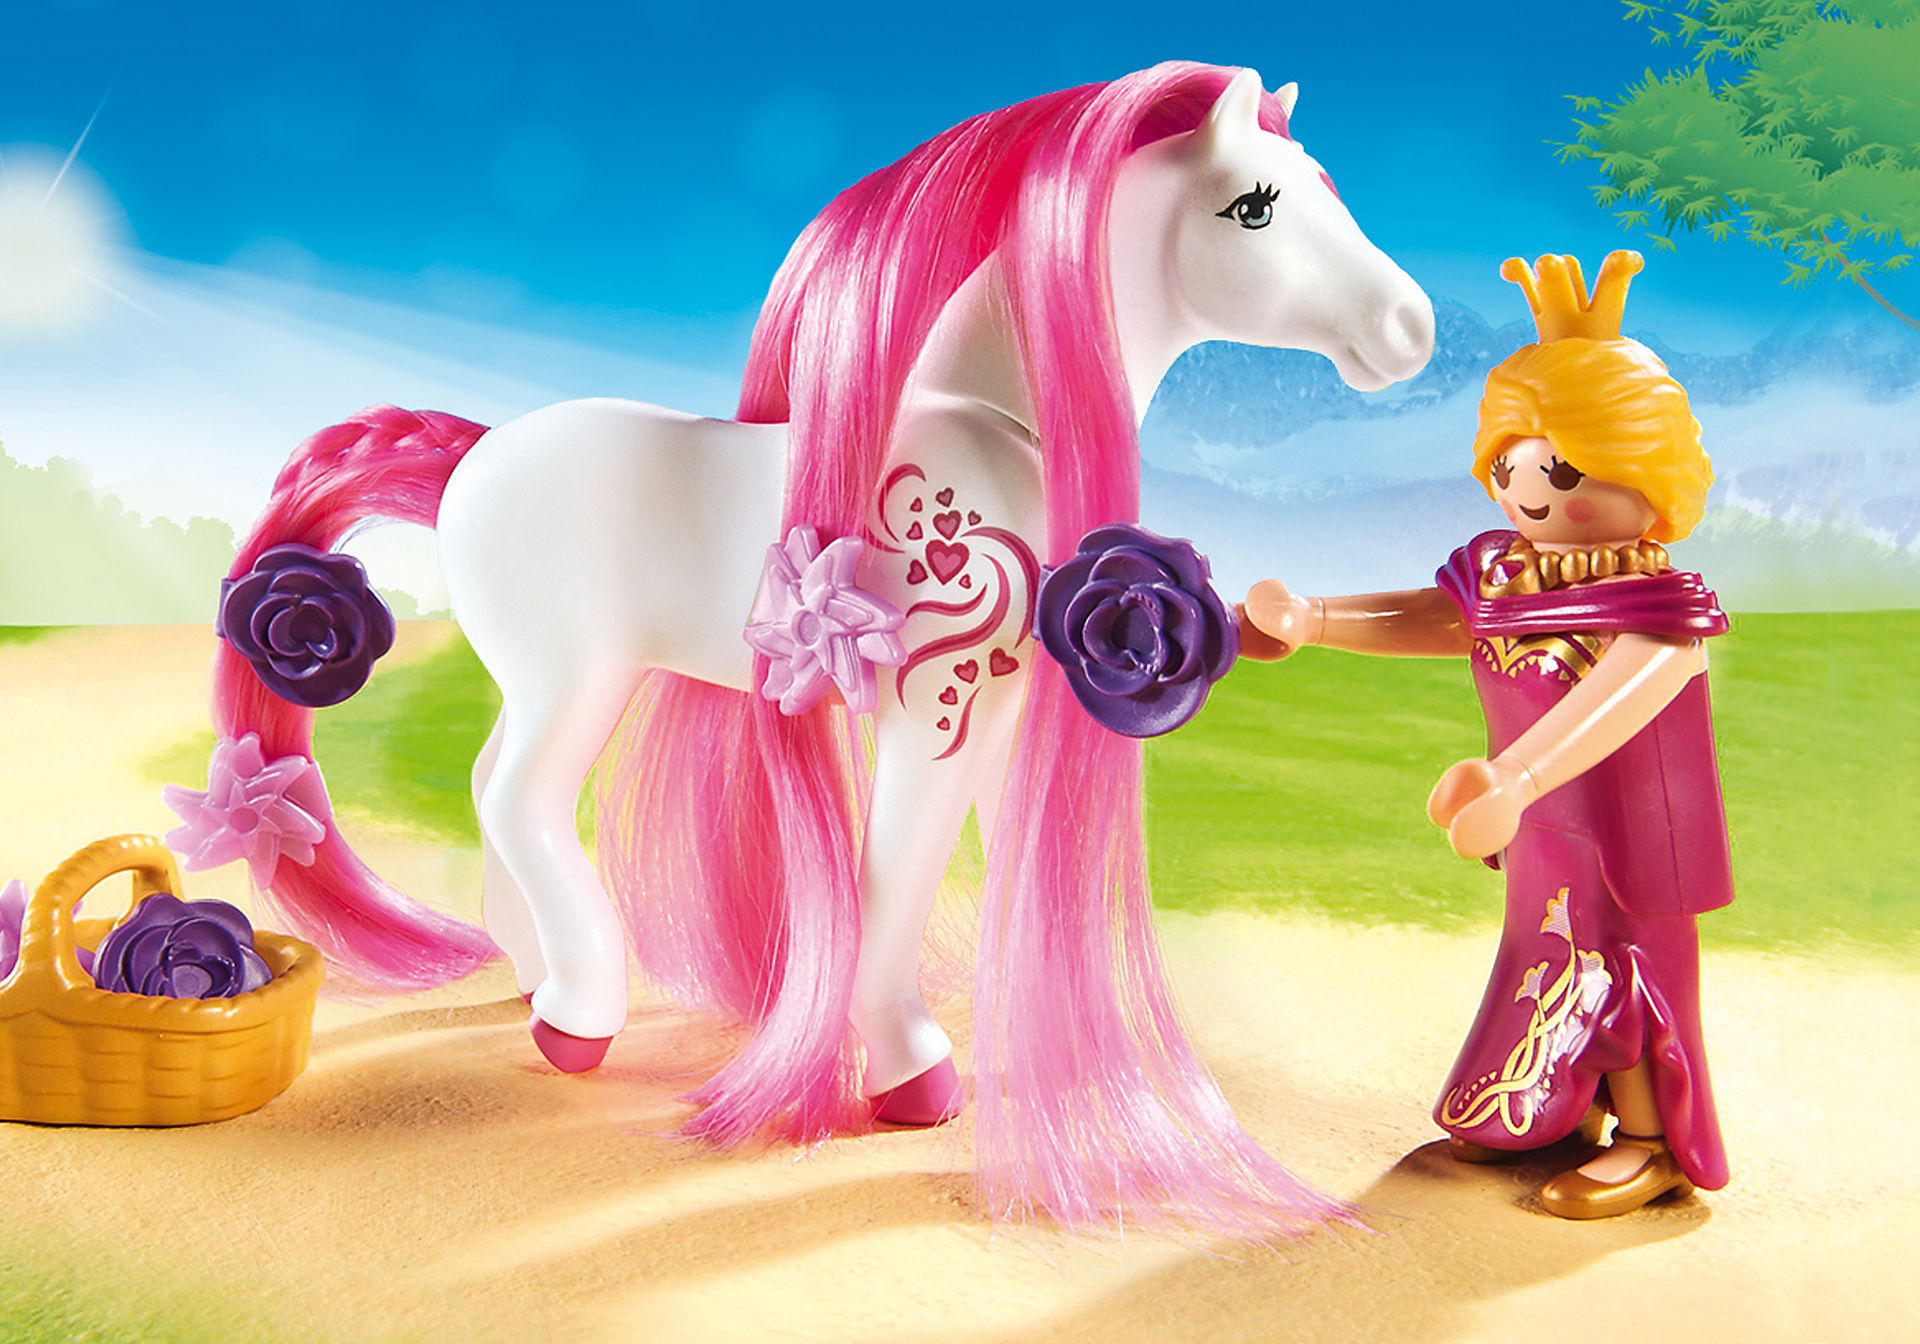 http://media.playmobil.com/i/playmobil/6856_product_extra1/Замок Принцессы: Королевская чета с каретой